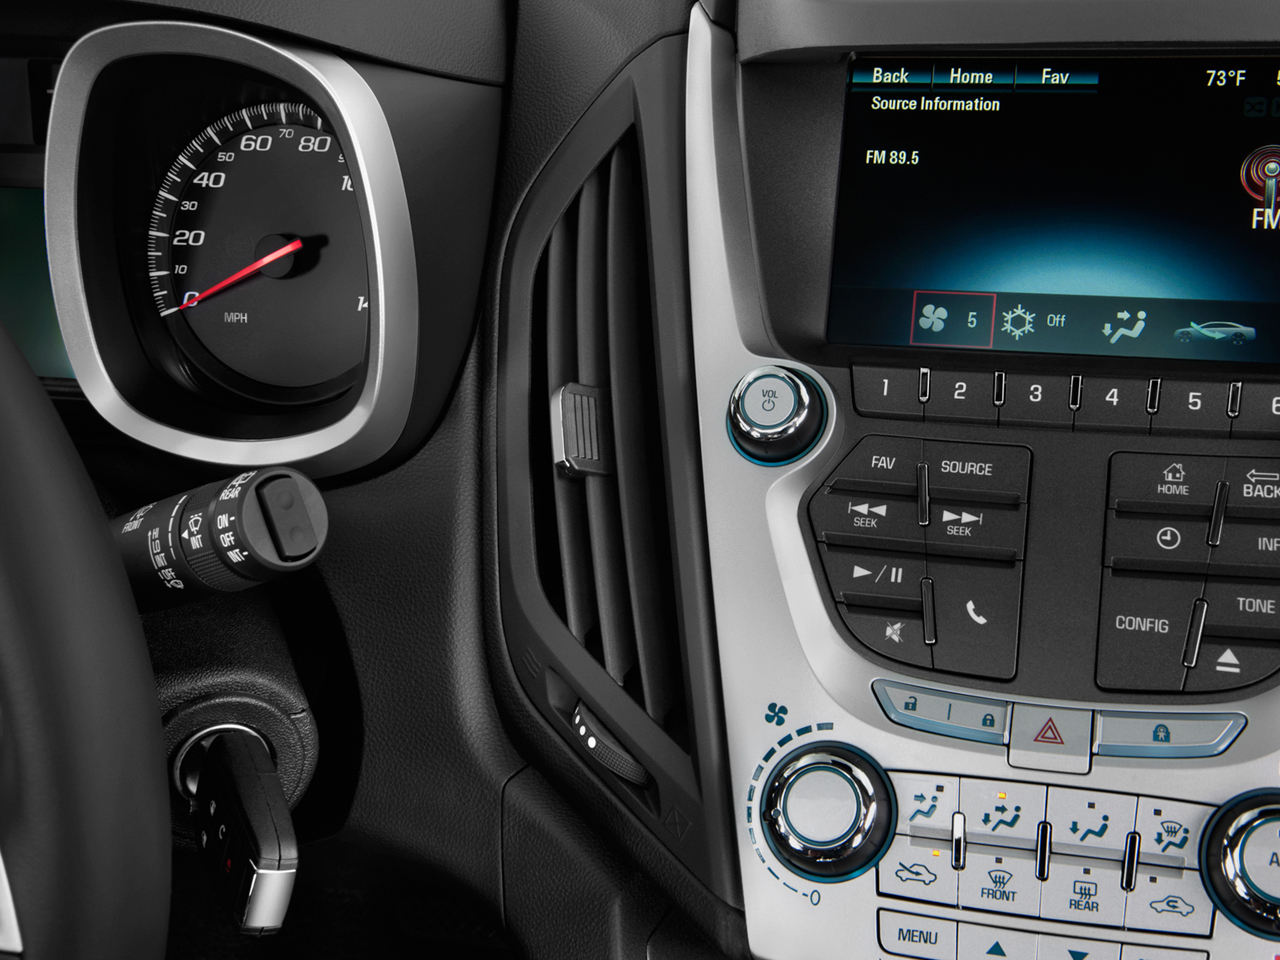 2012 Chevy Equinox Interior | 2012 Chevrolet Equinox LS Sport ...